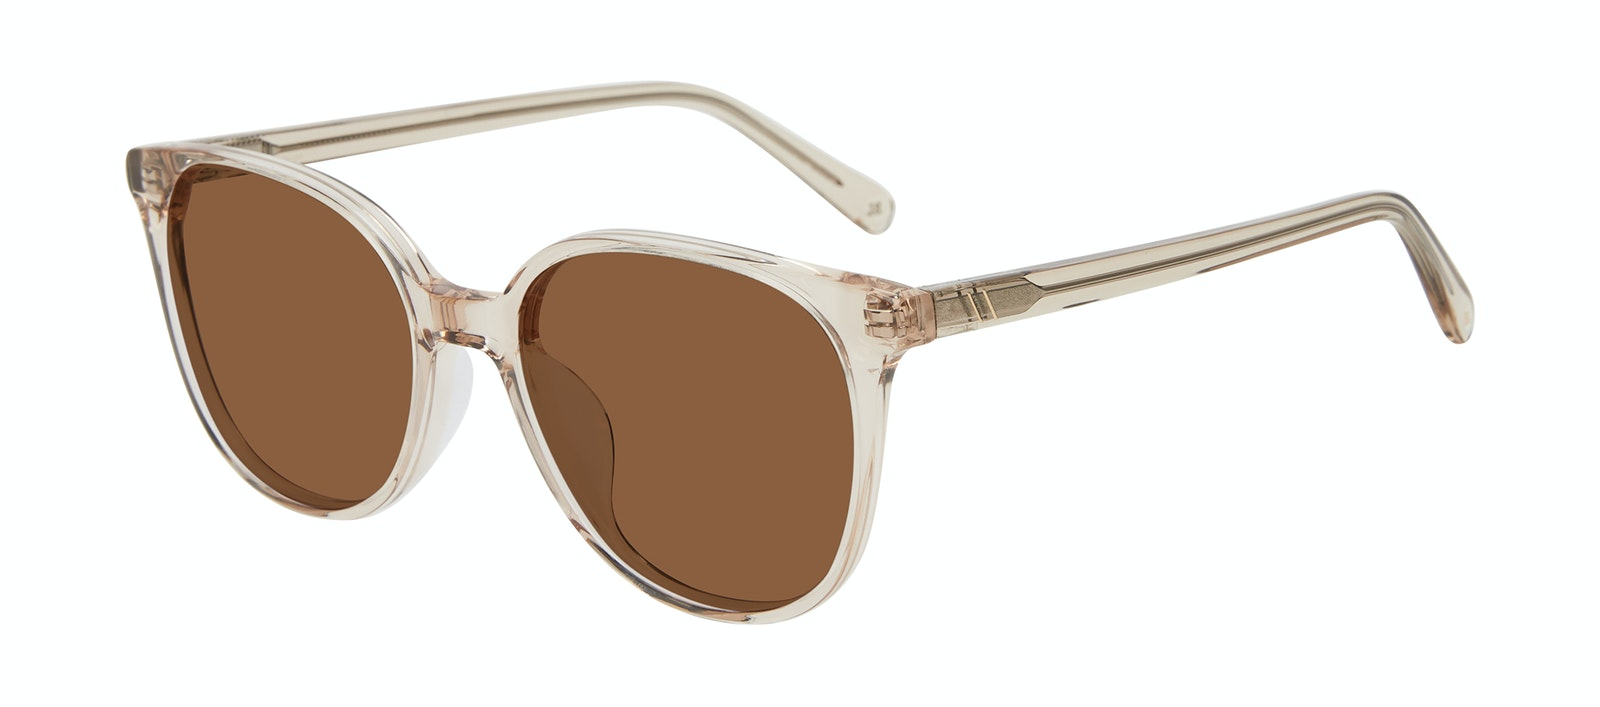 Affordable Fashion Glasses Square Sunglasses Women Novel Blond Tilt